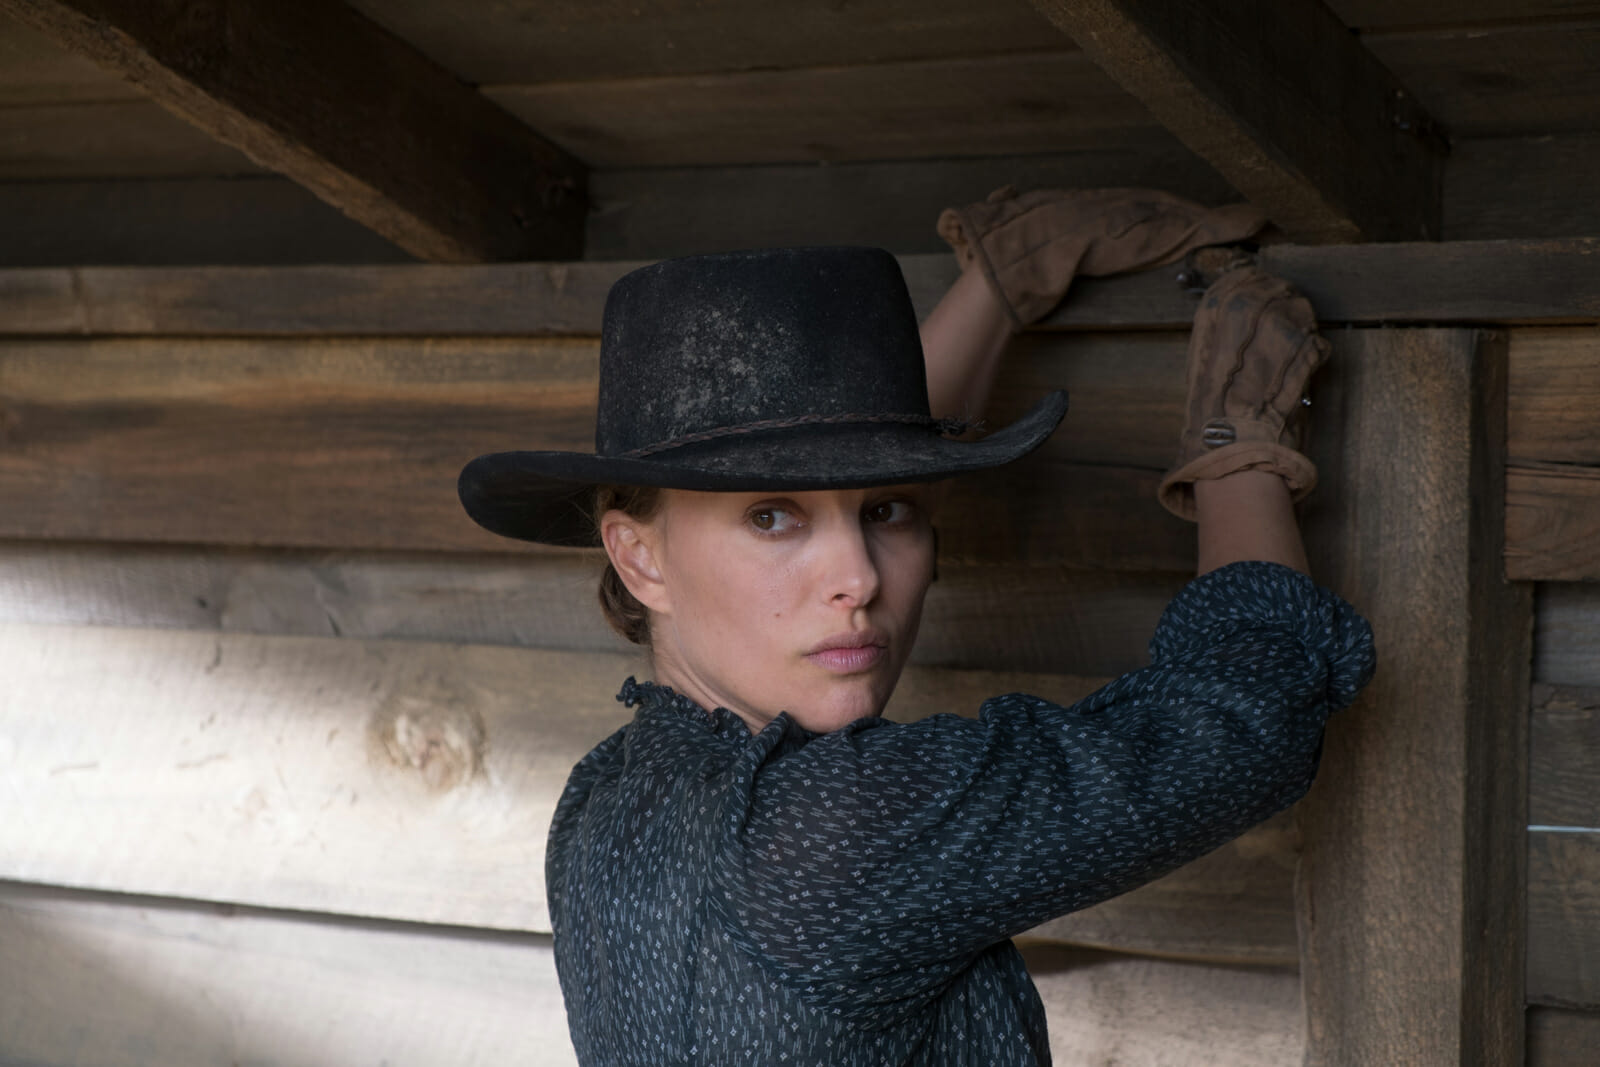 Jane-got-a-gun-Natalie-Portman